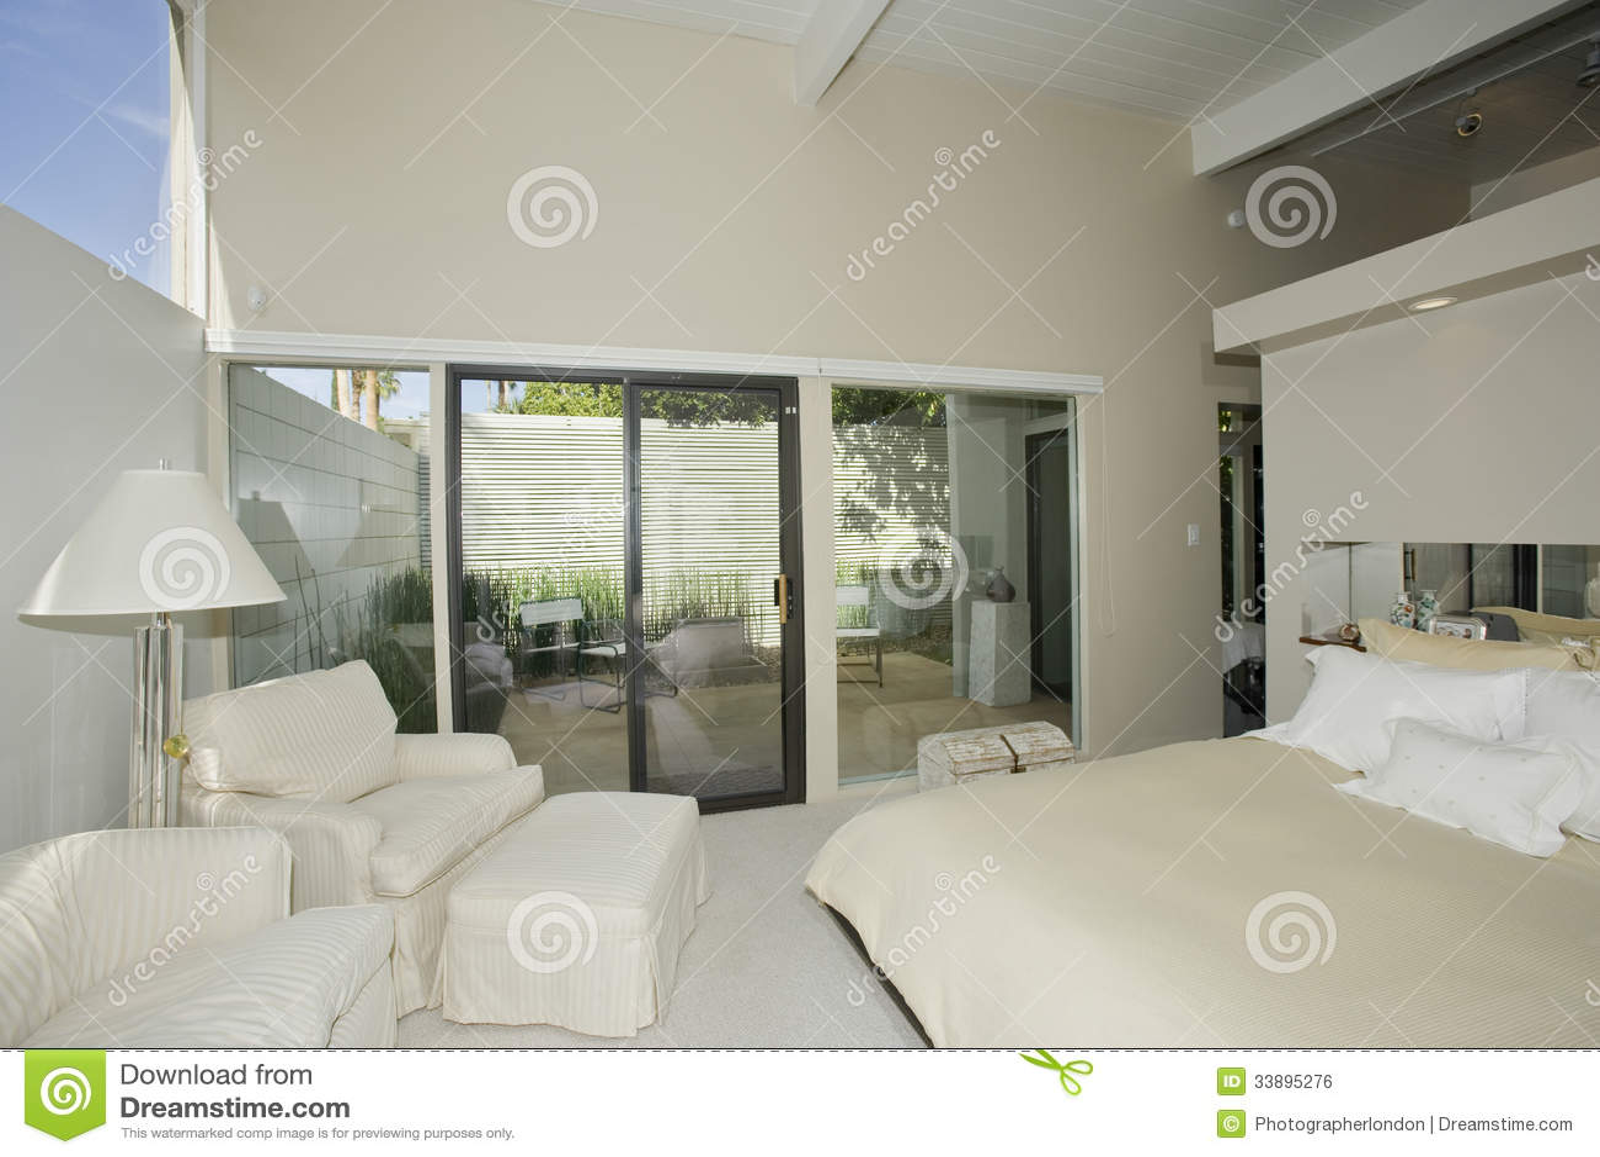 Bedroom in Modern Home